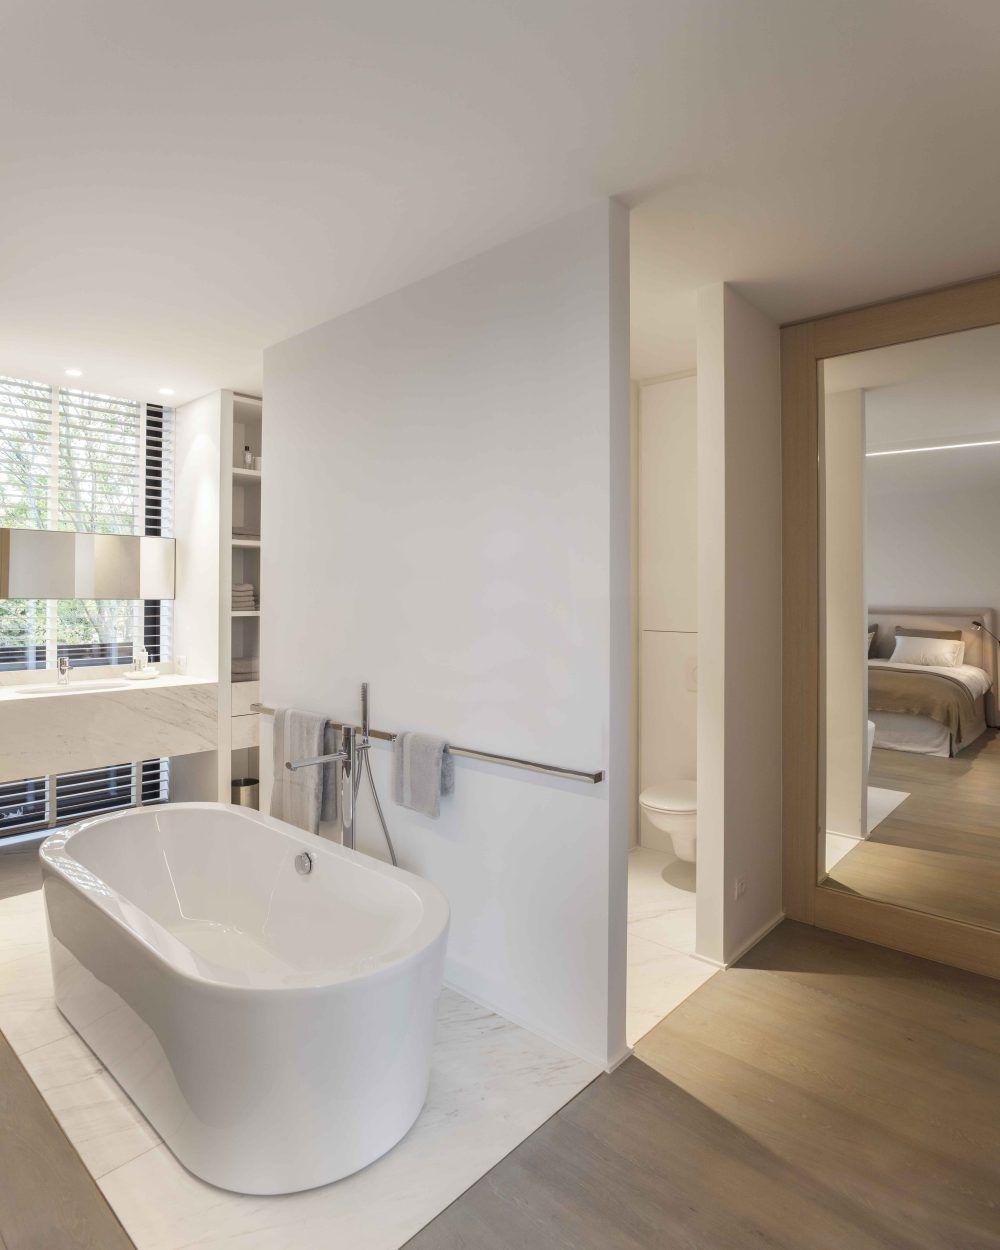 Verrrrry Interesting For Both Shower Room Suite Upper